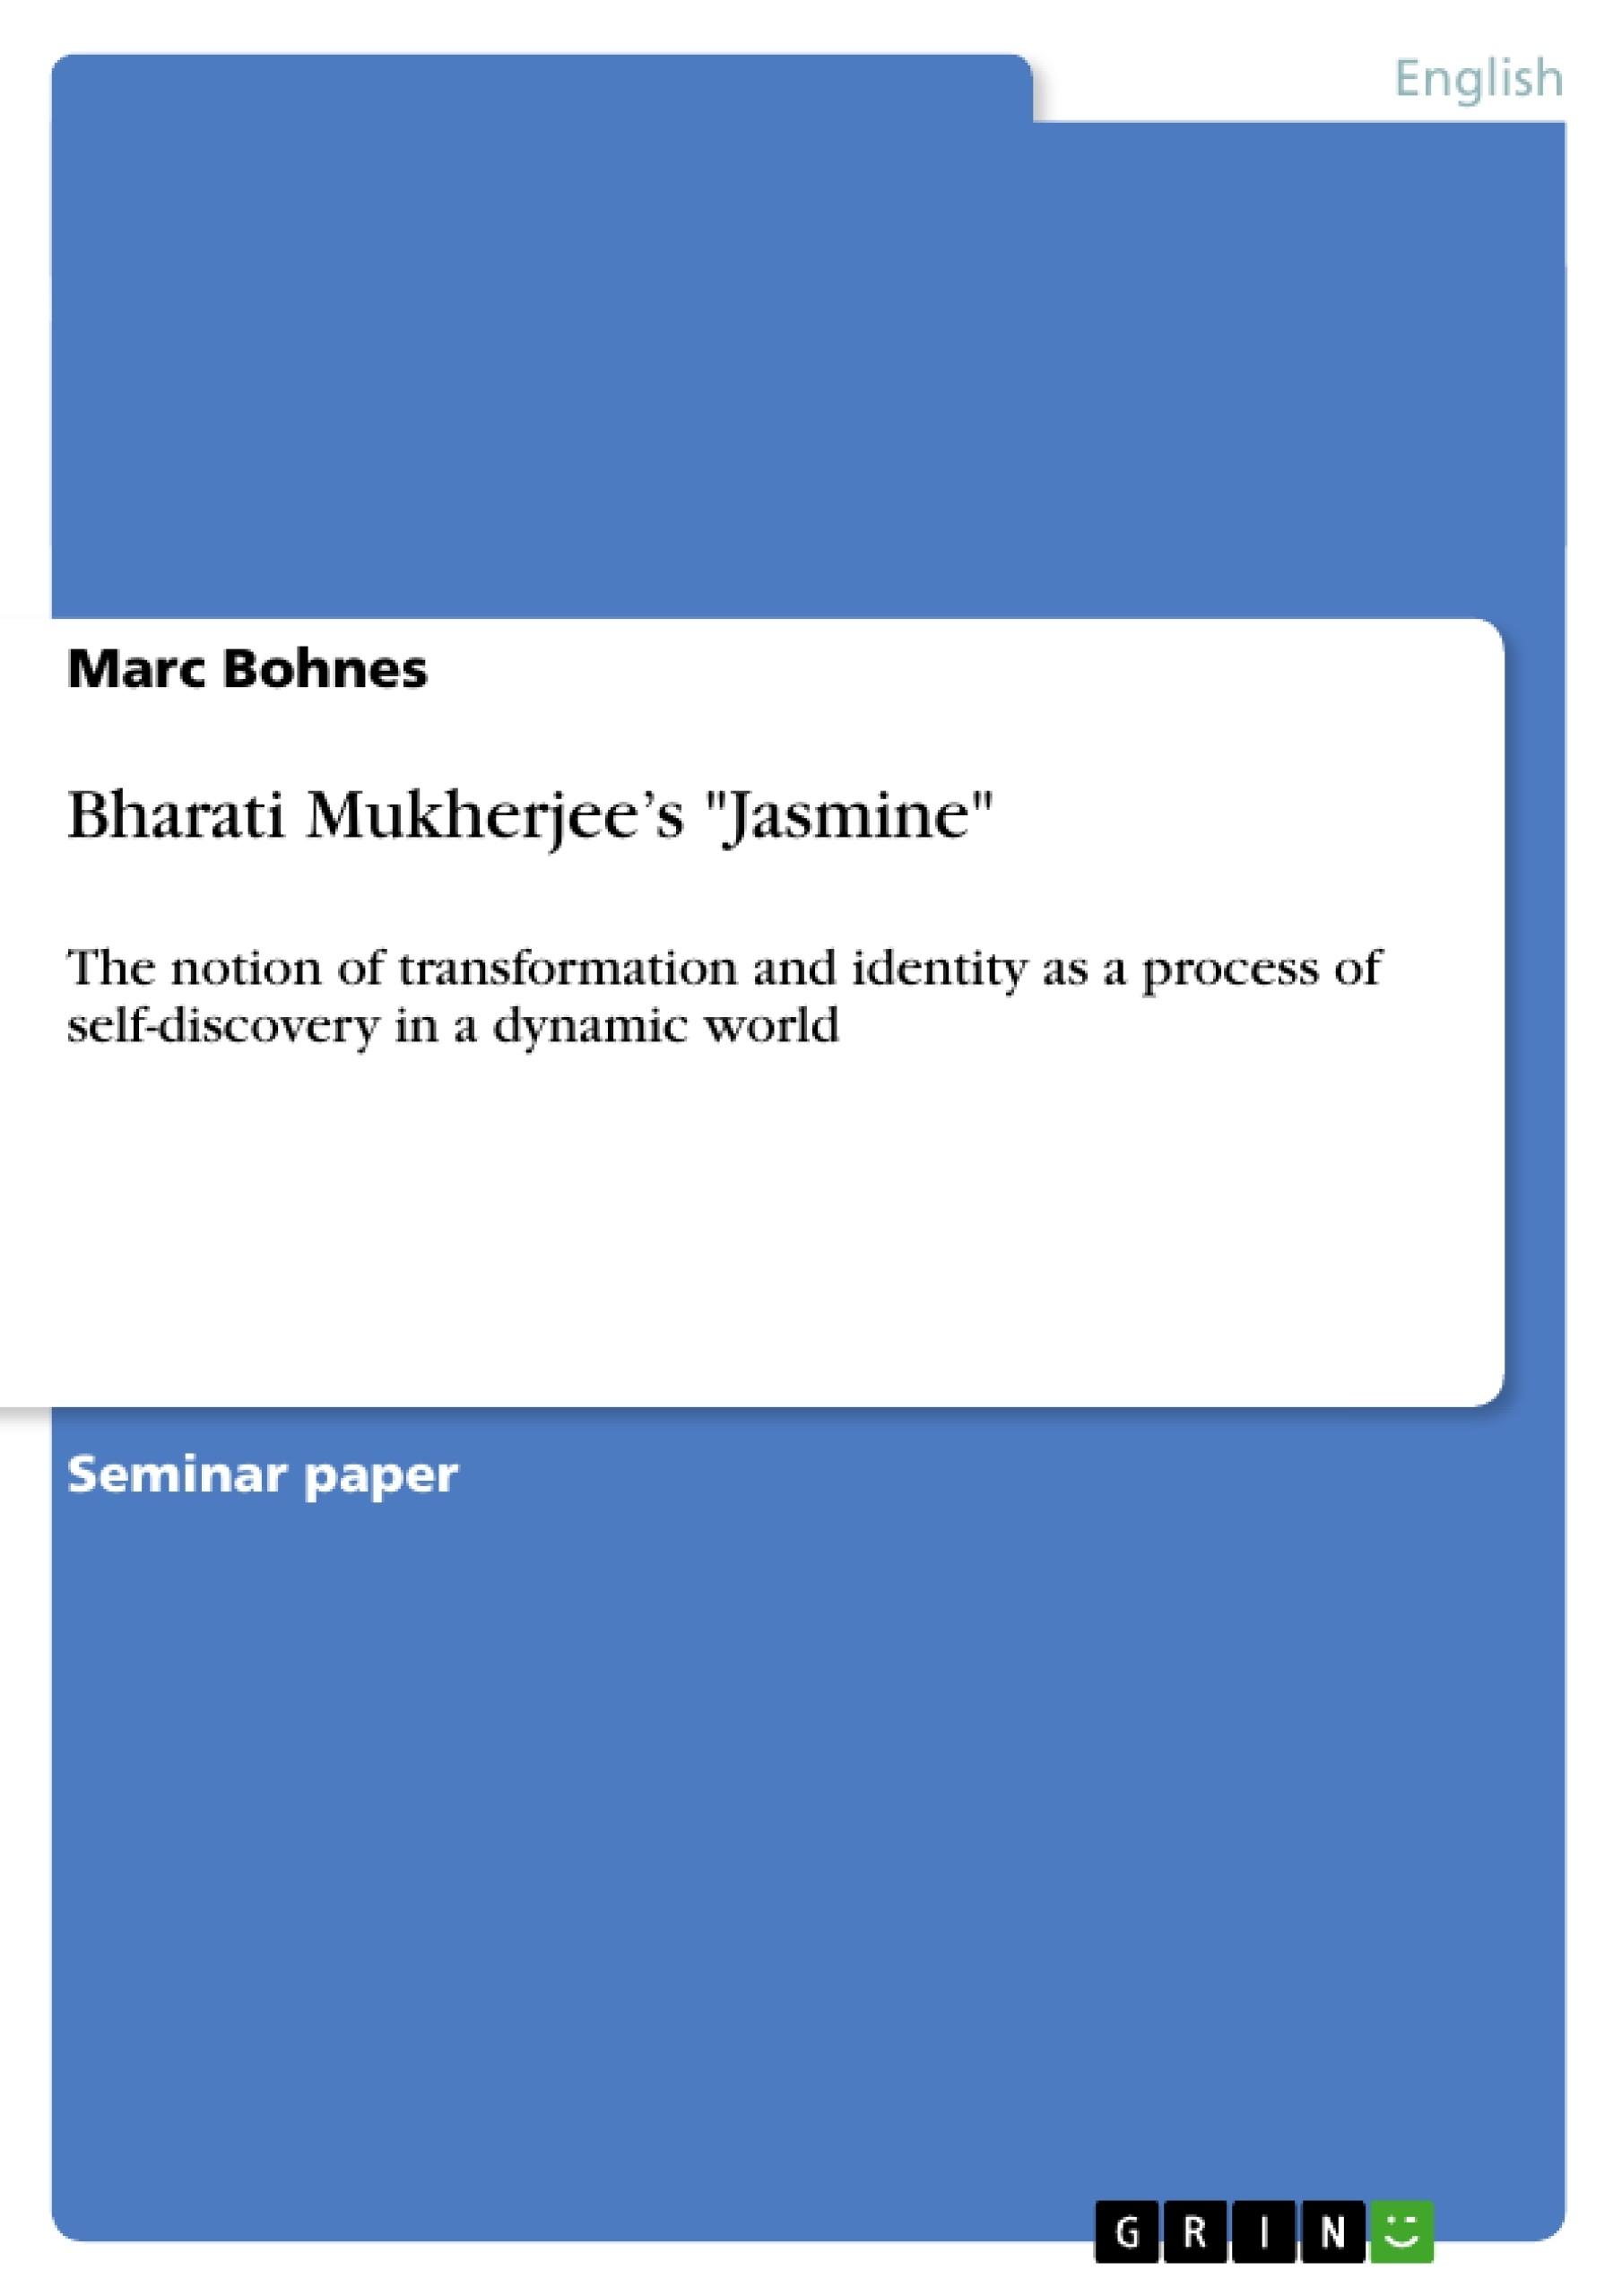 analysis on bharati mukherjee english literature essay The new identity creates problems for tara in desirable daughters by bharati mukherjee,  essay, desirable daughters analysis  english literature essay writing.